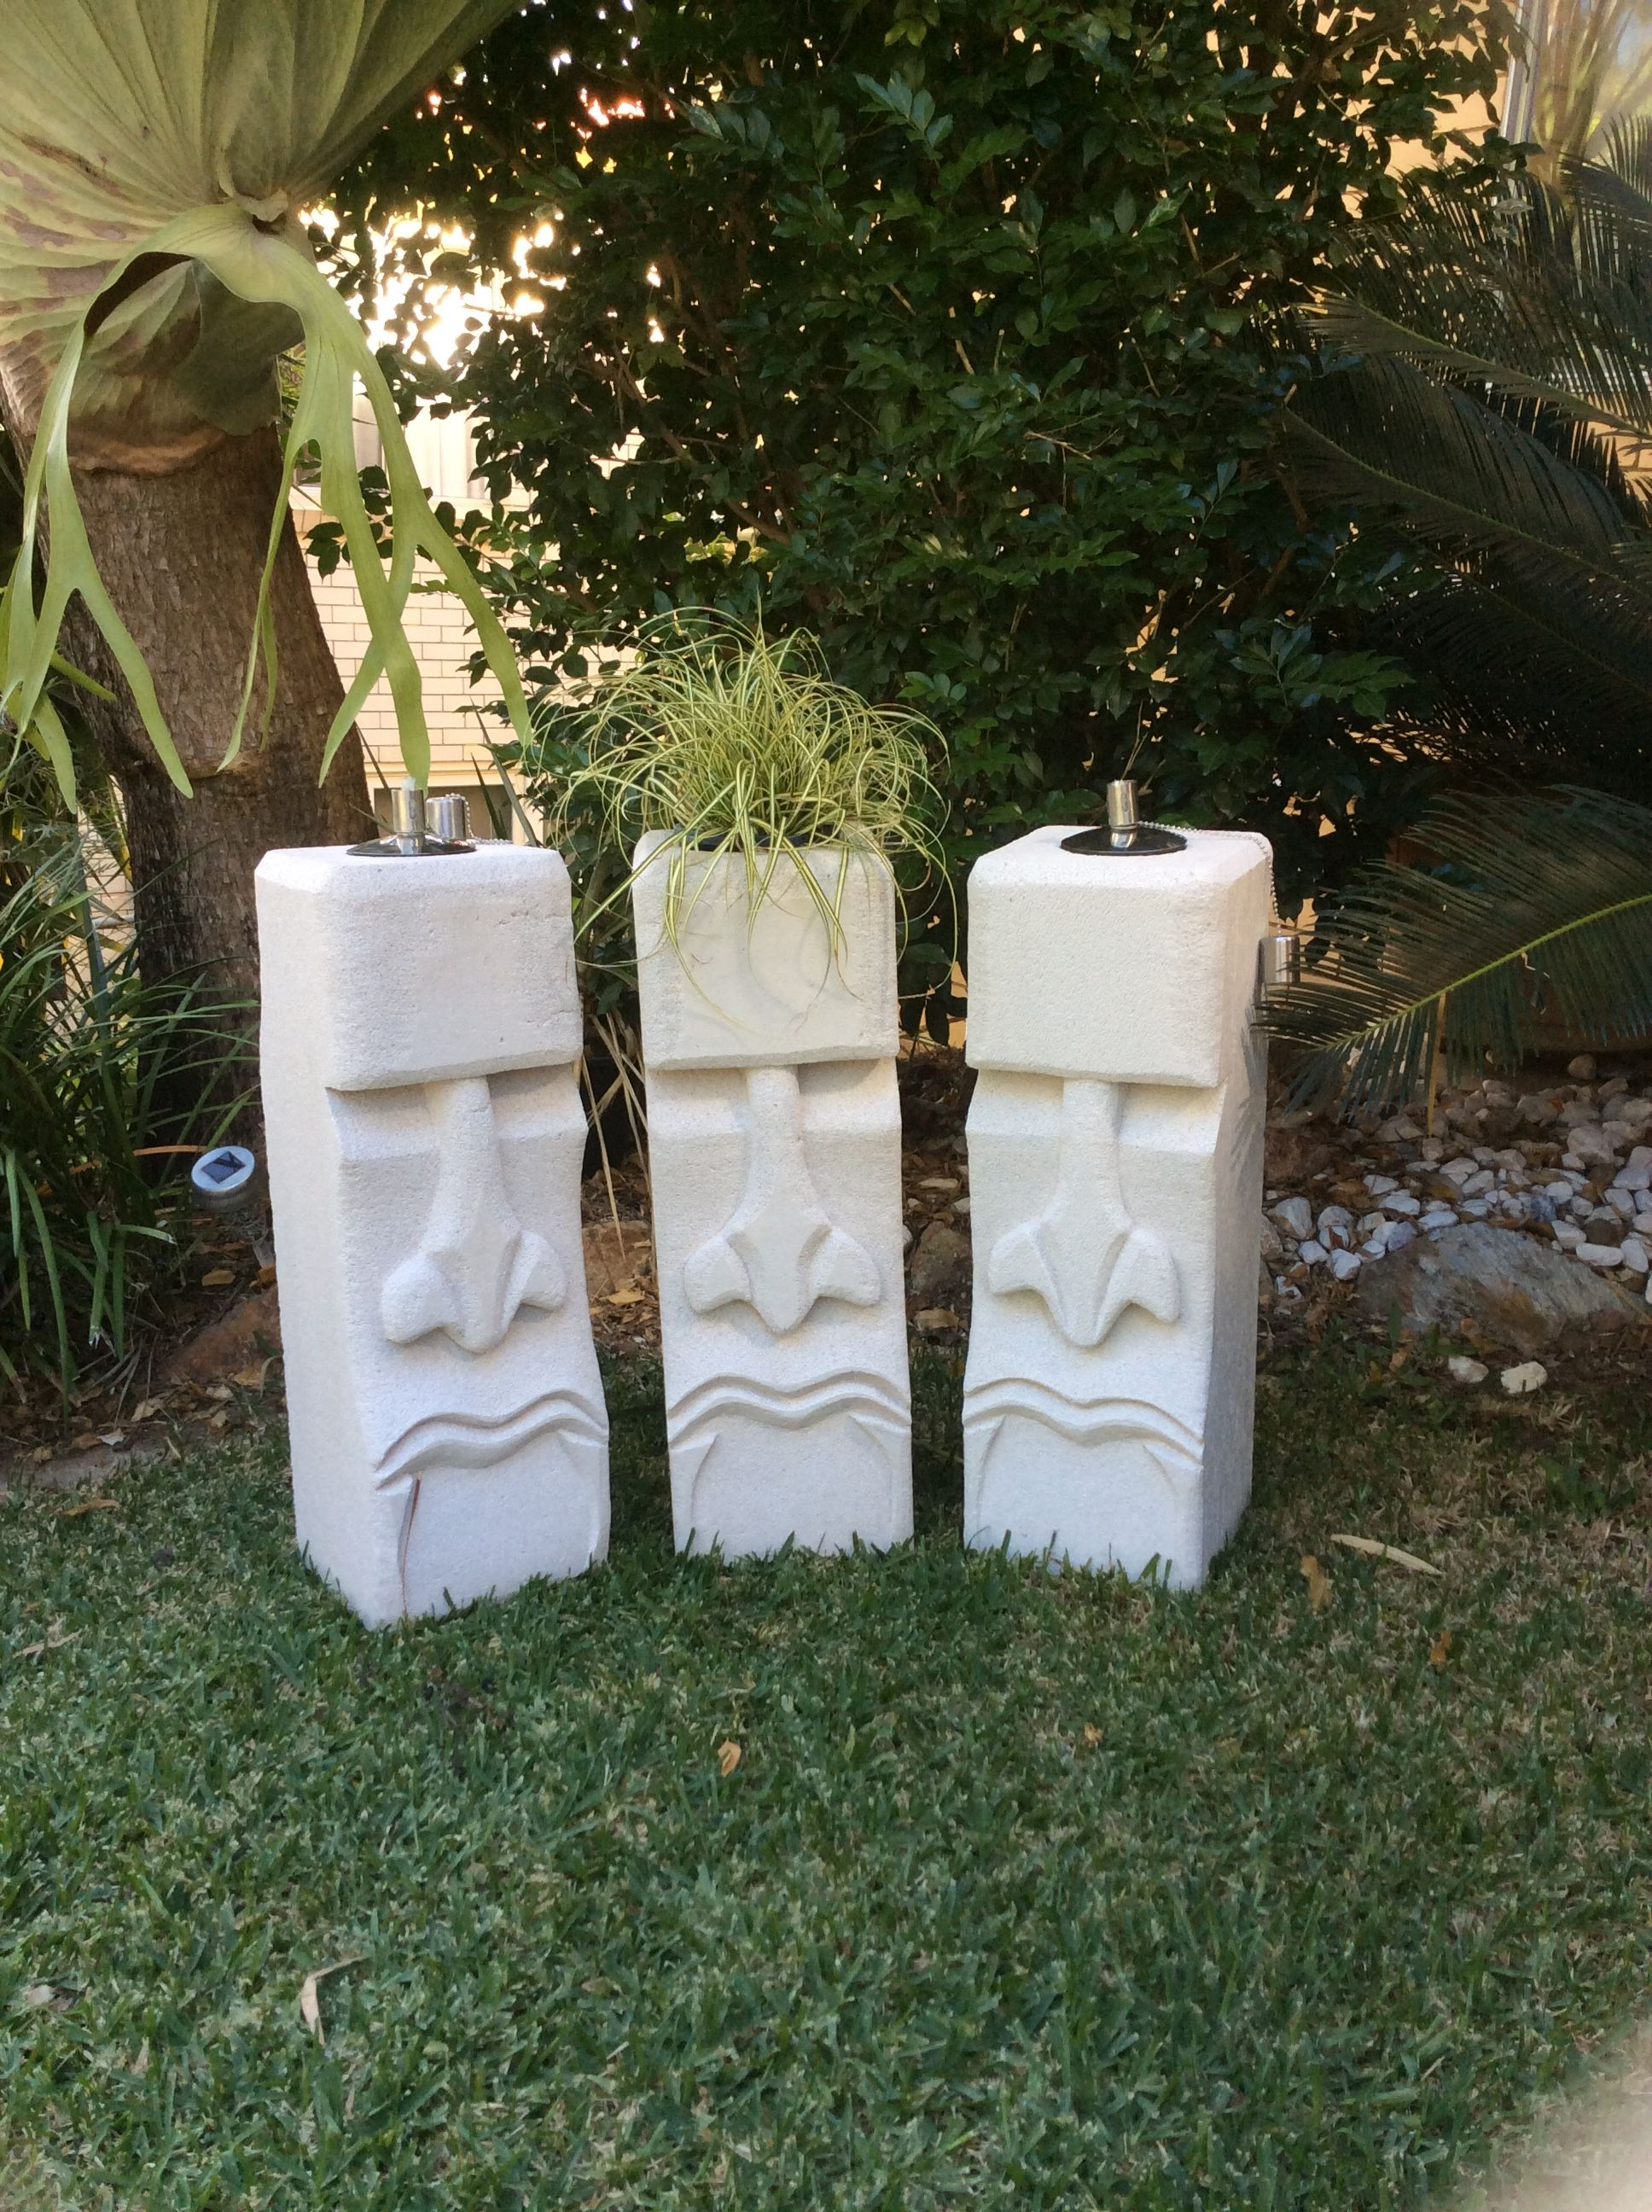 Hebel Sculptures By Gary Grogan For Sale Ytong Steine Steinskulptur Ytong Sculpture